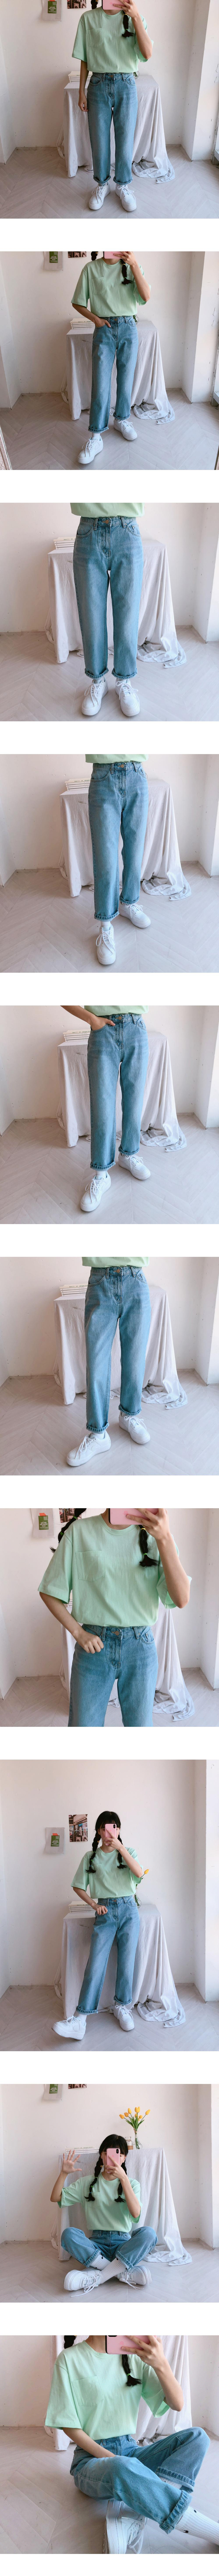 736 denim pants